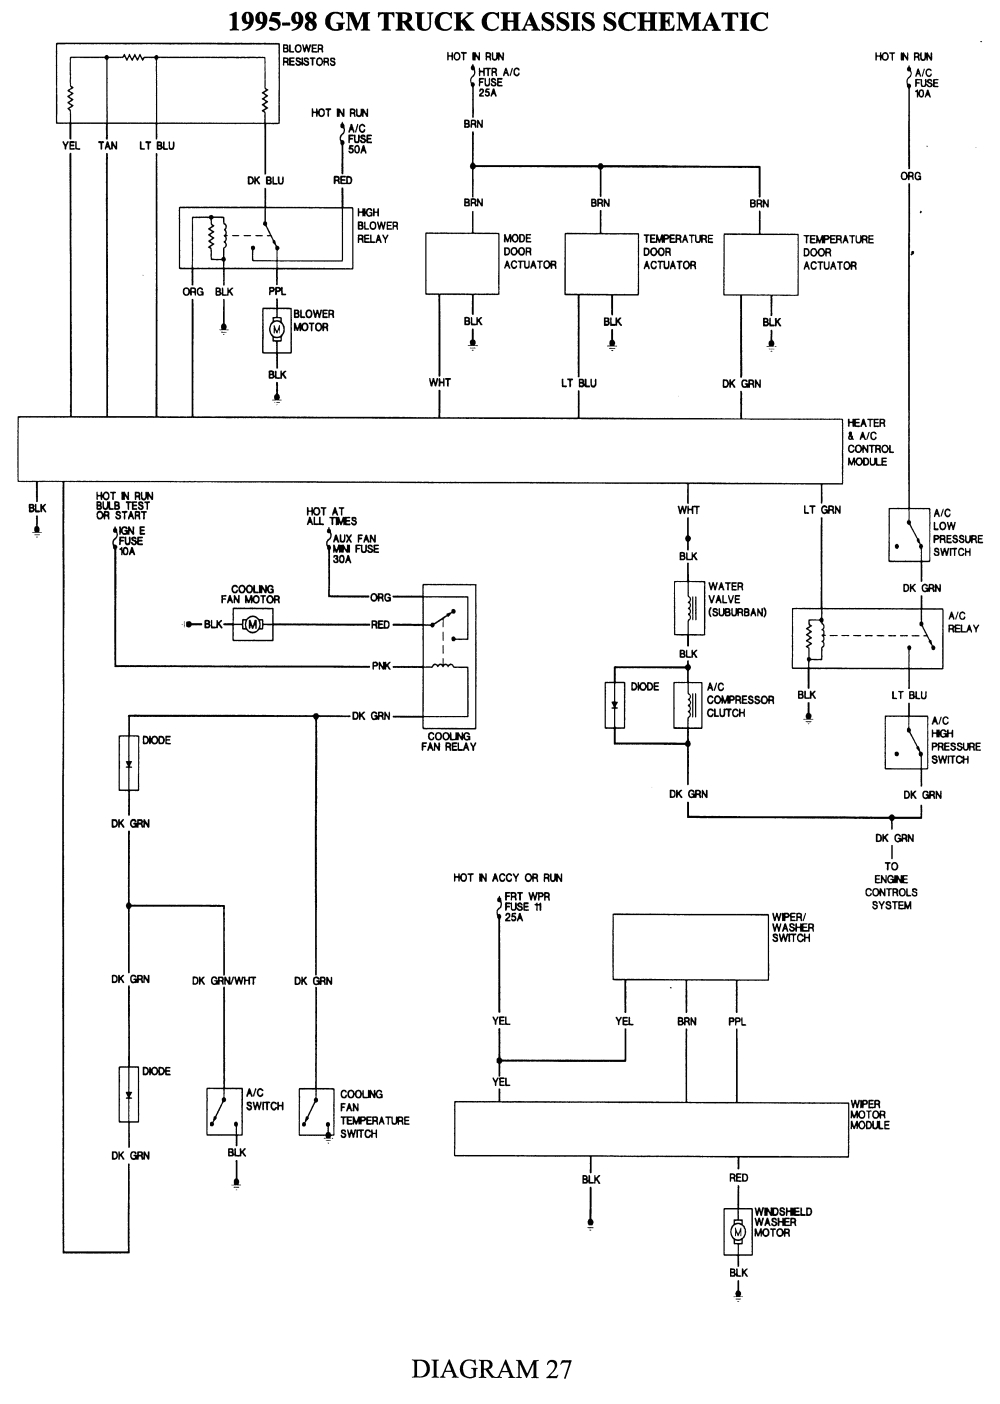 1988 Chevy Truck Wiring Diagram Repair Guides Wiring Diagrams Wiring Diagrams Autozone Com